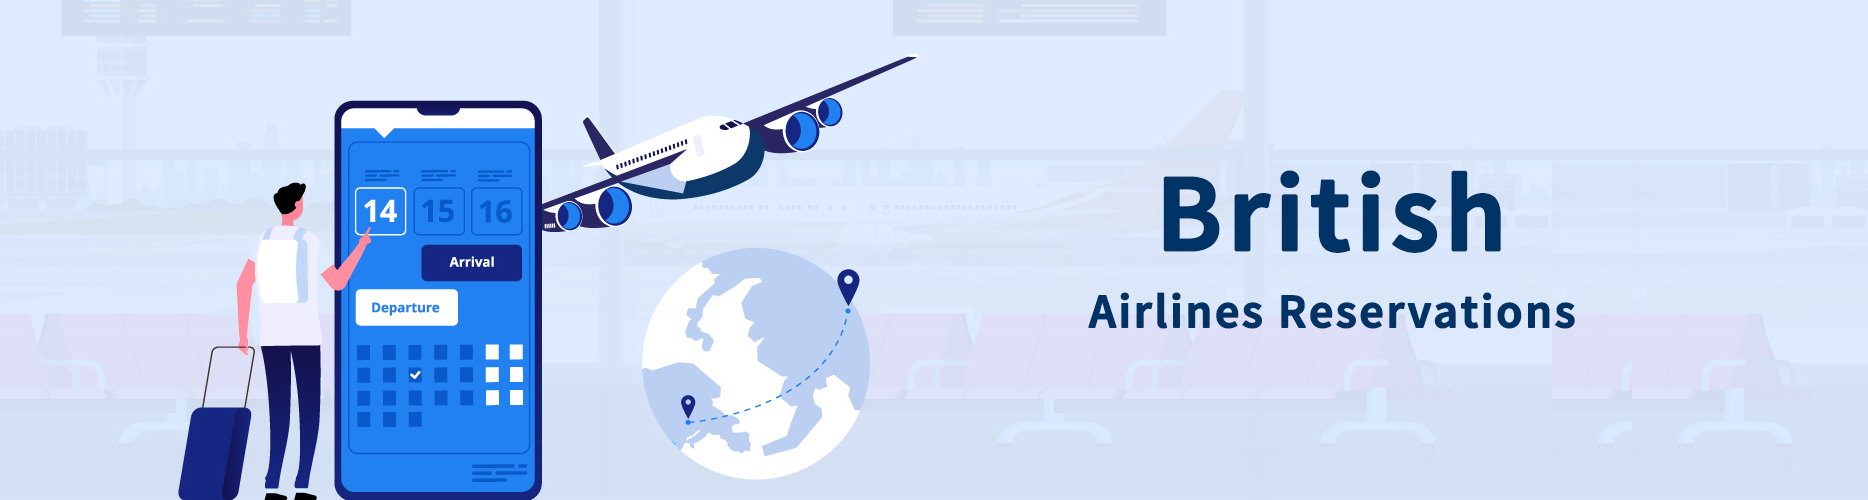 British Airways Reservations, ☎ 1-833-949-1800 Book a Flight With Deals